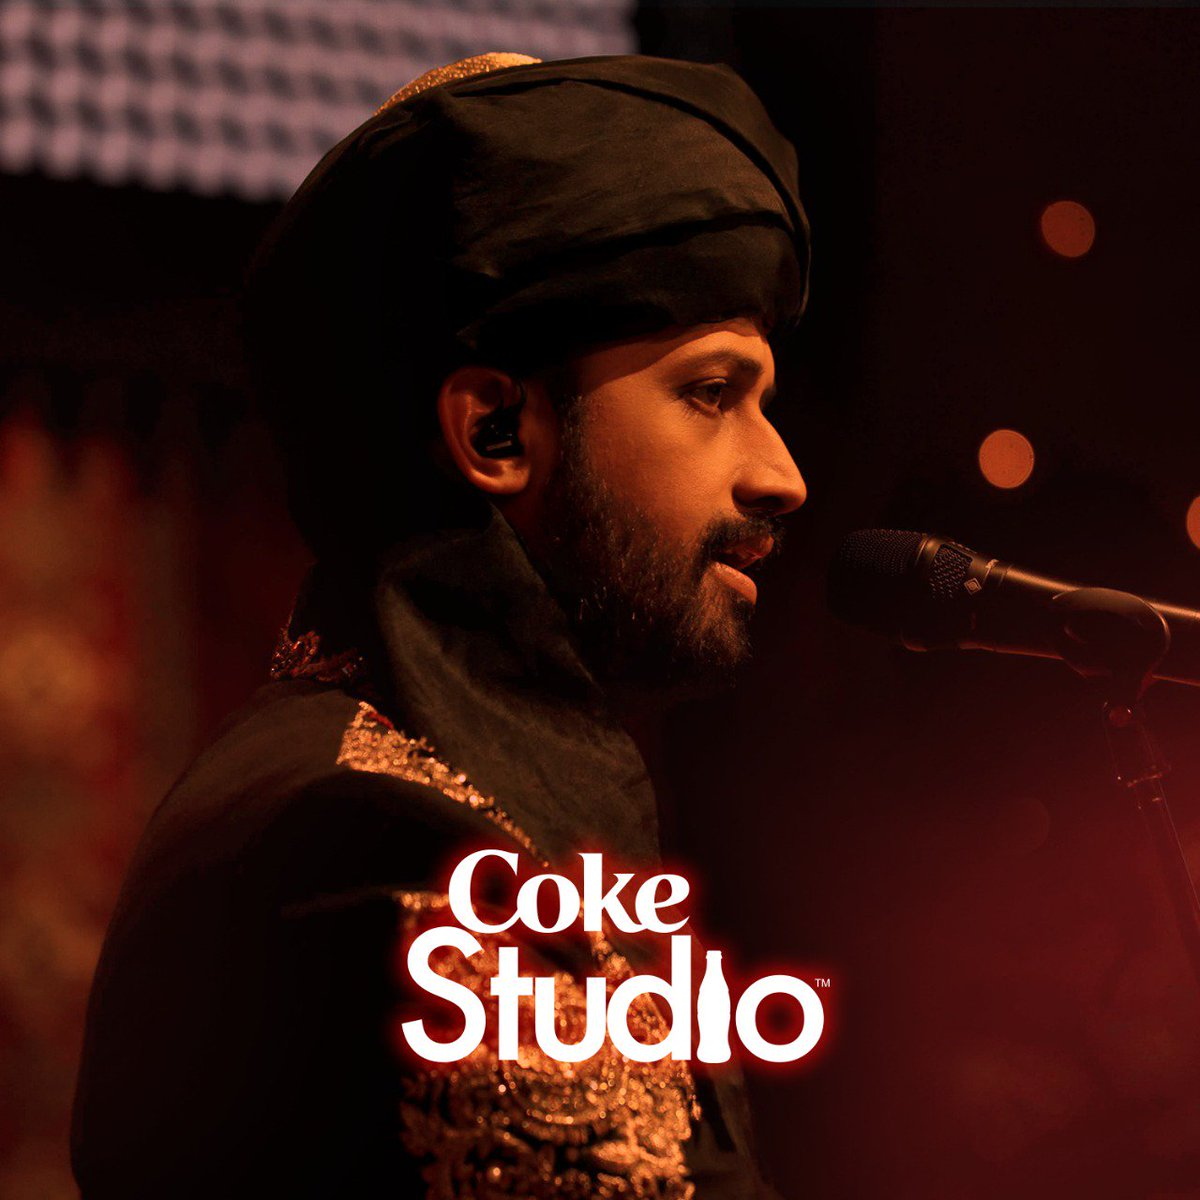 "Atif Aslam on Twitter: ""Coke Studio Season 12 Coming Soon! Gear up! # AtifAslam #Aadee #Aadeez #CokeStudio #Season12… """